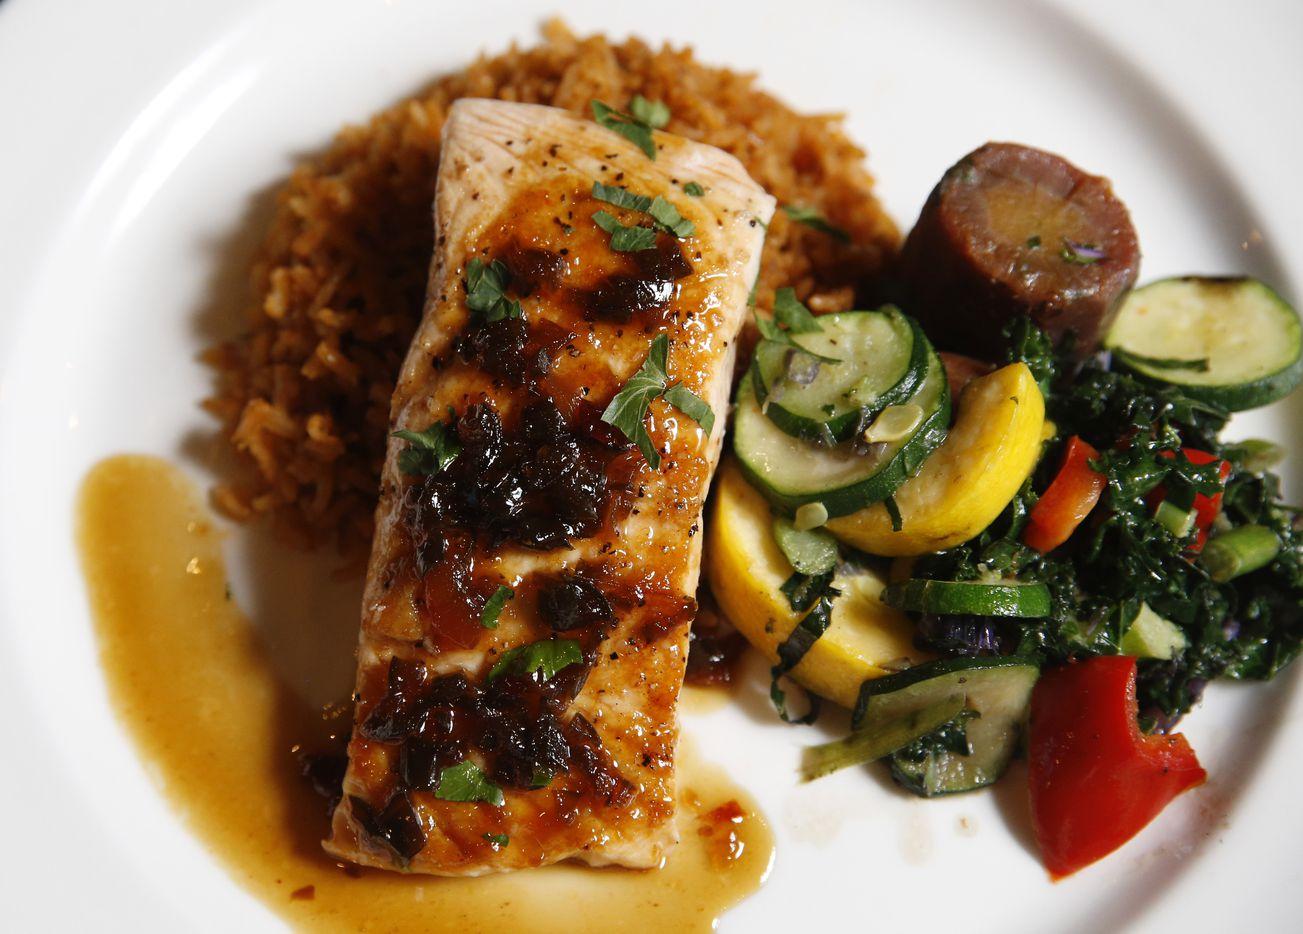 Mango jalapeño glazed salmon dish at Daylight Golf on Thursday, January 21, 2021in Grapevine, Texas. The sports bar restaurant features virtual golf.